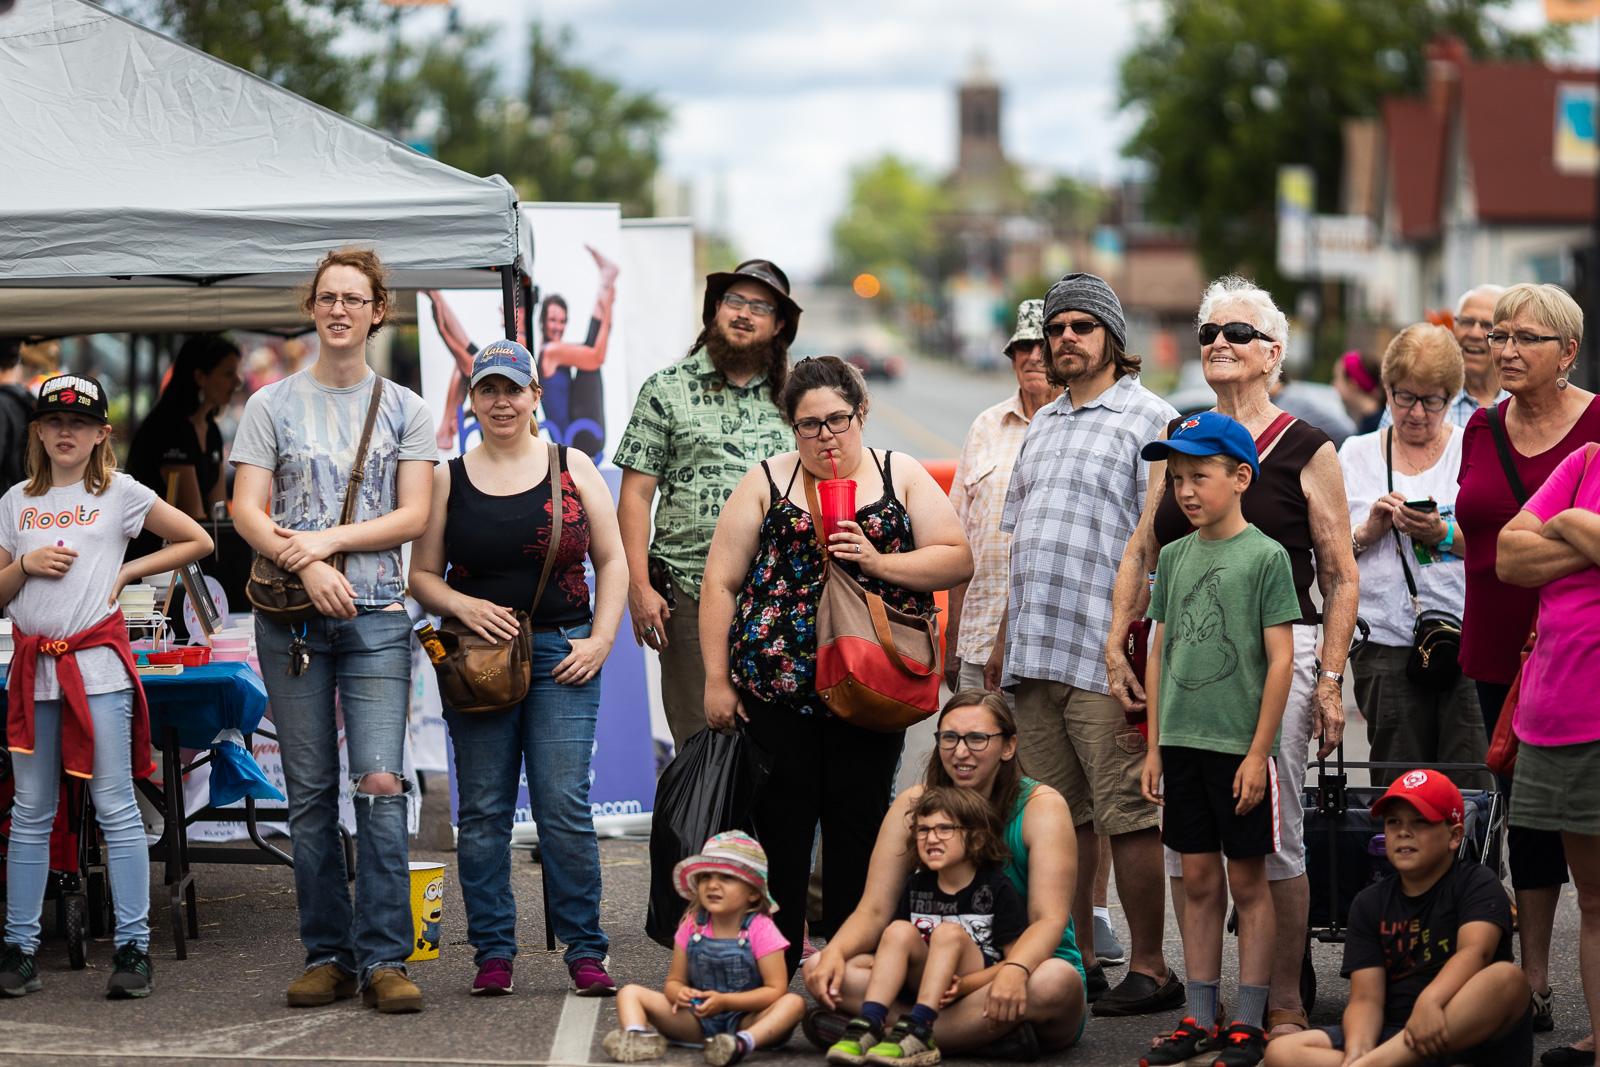 7th-annual-buskers-festival-blog-41.jpg